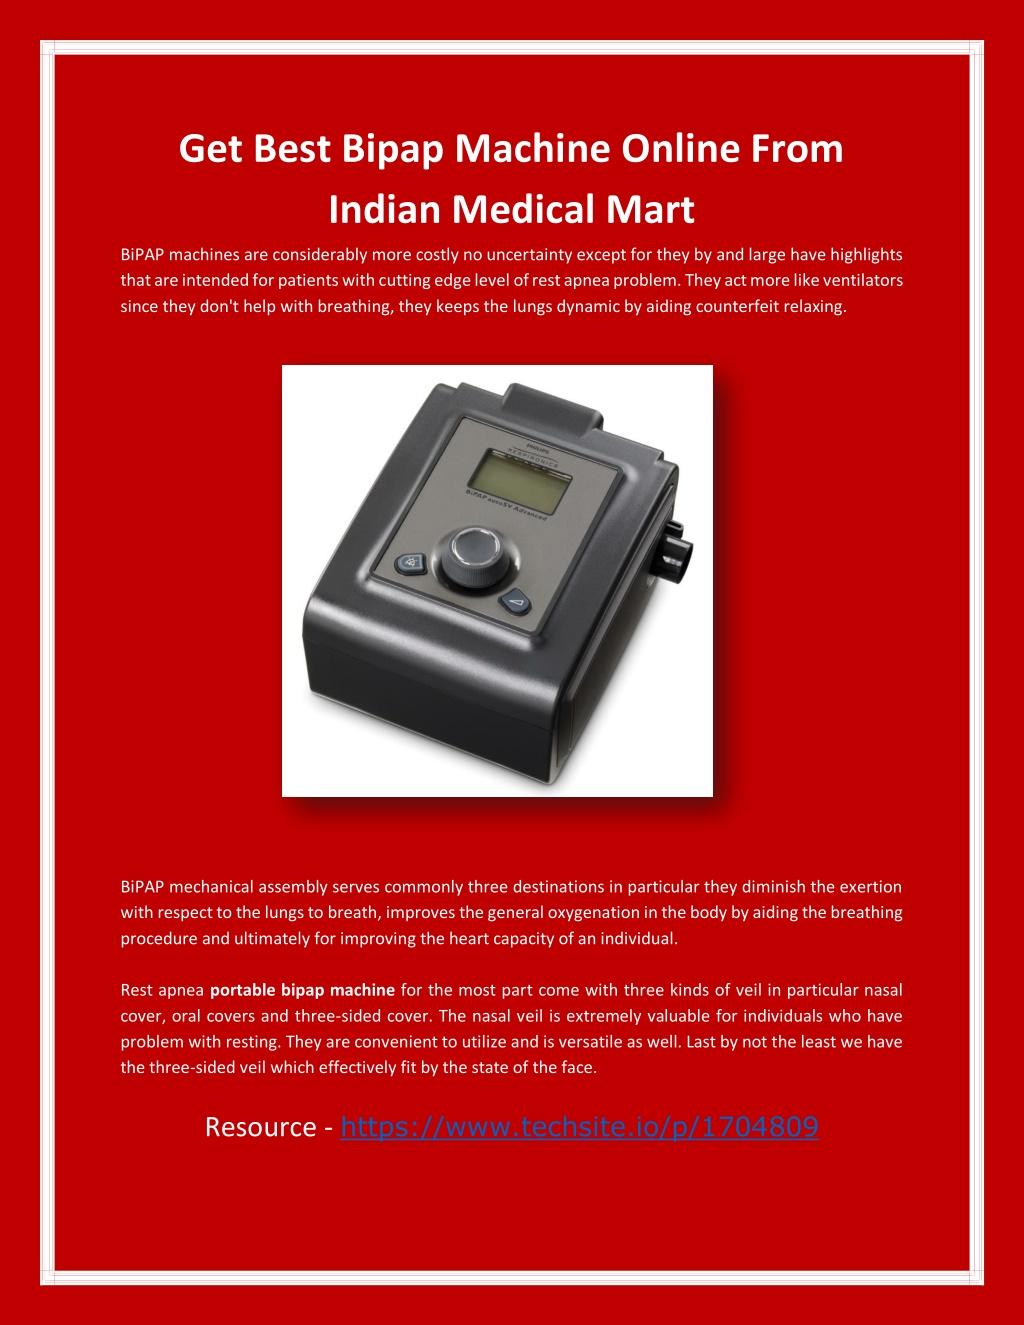 Get Best Bipap Machine Online From Indian Medical Mart